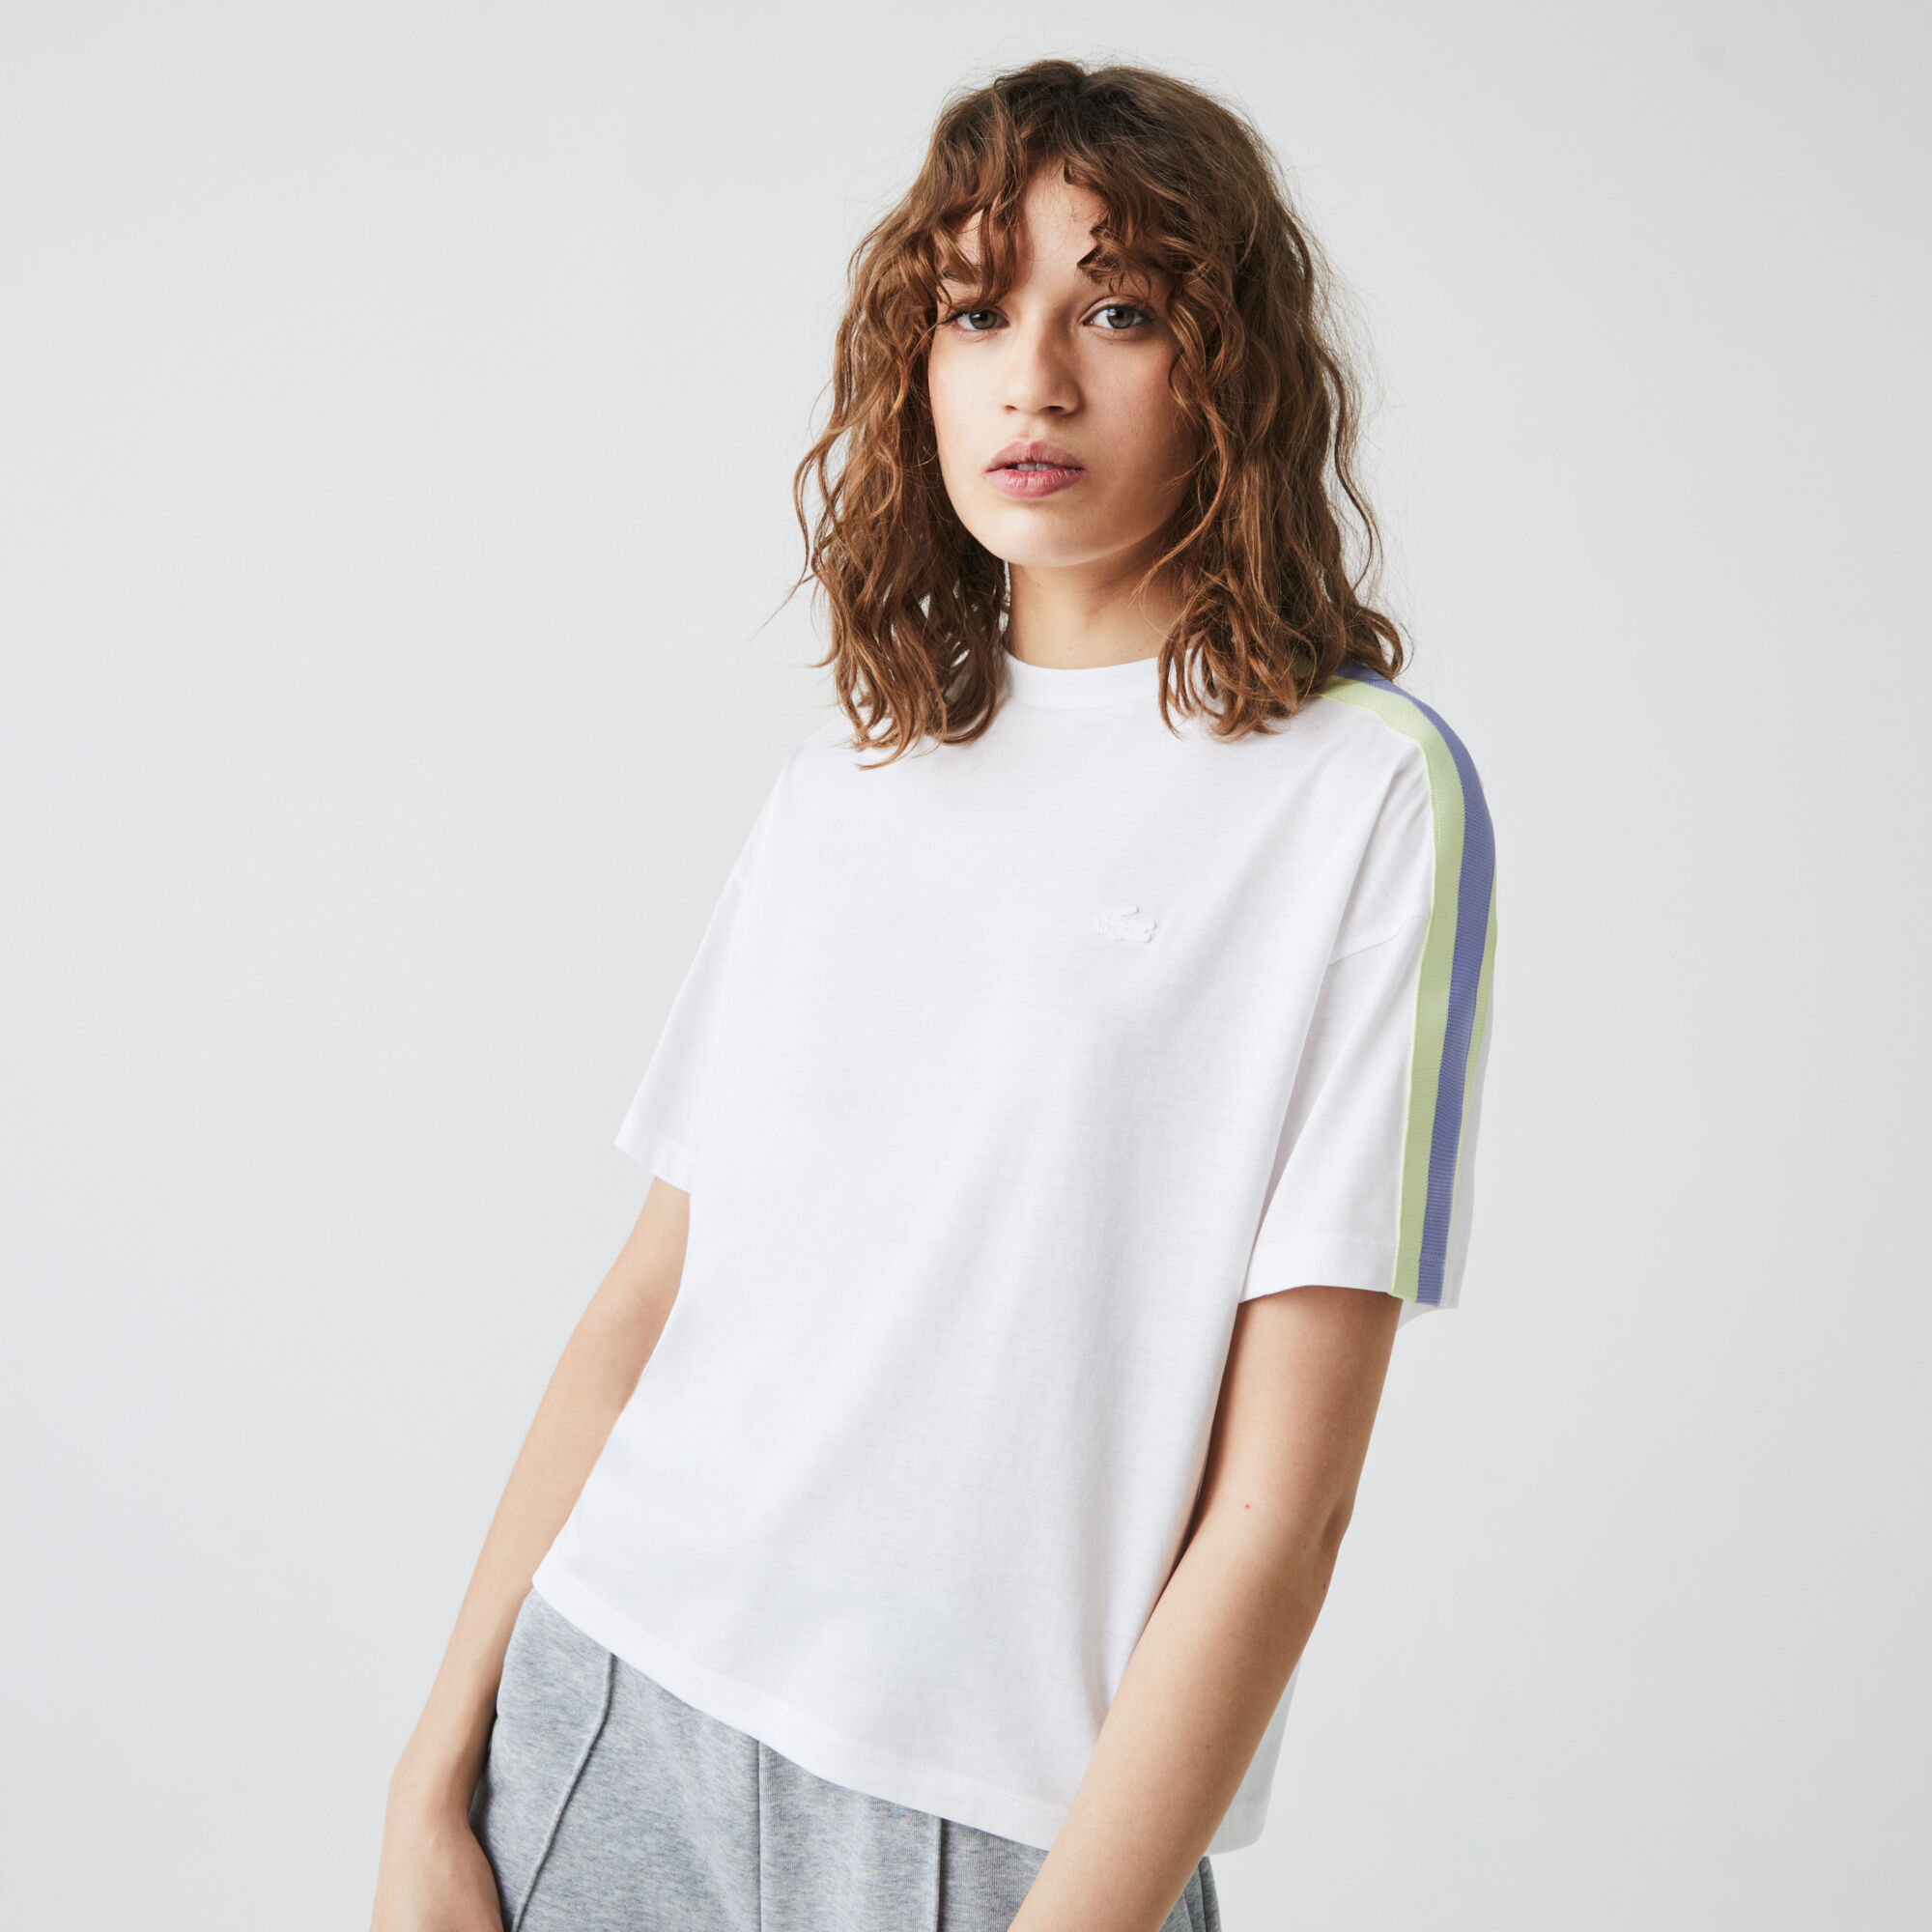 Women's Contrast Bands Flowing Cotton Blend T-shirt